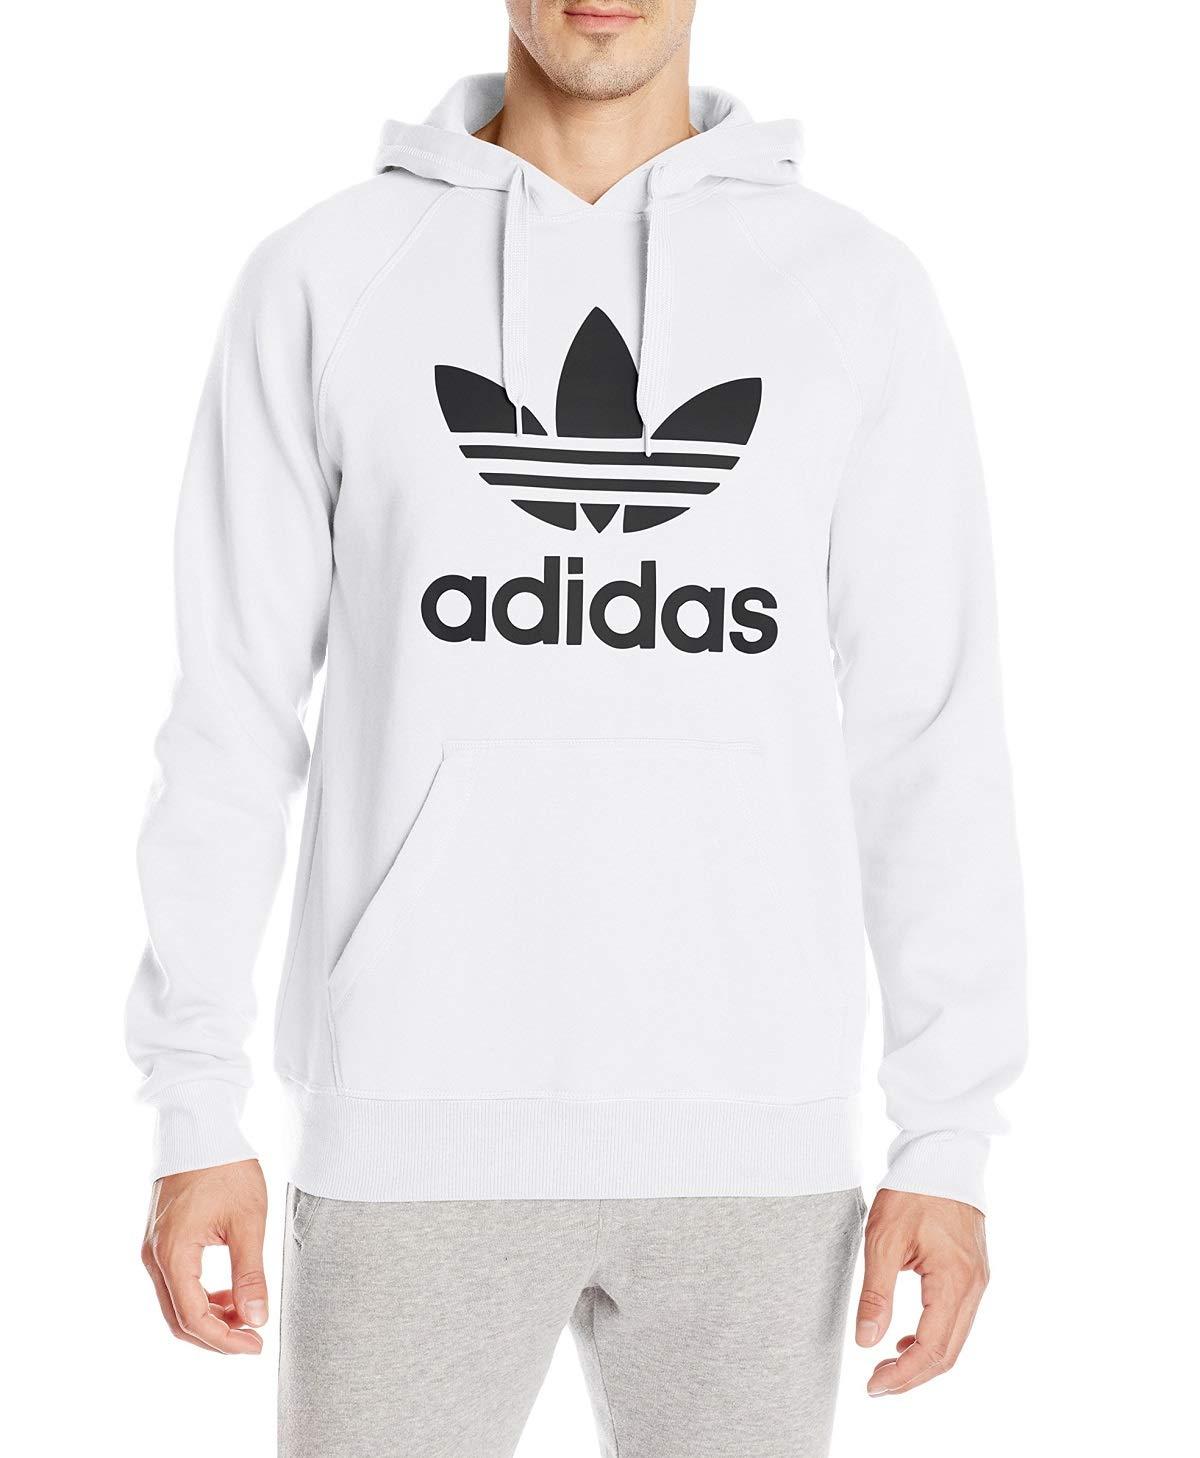 adidas Originals Men's Trefoil Hoodie, White/Black, X-Large by adidas Originals